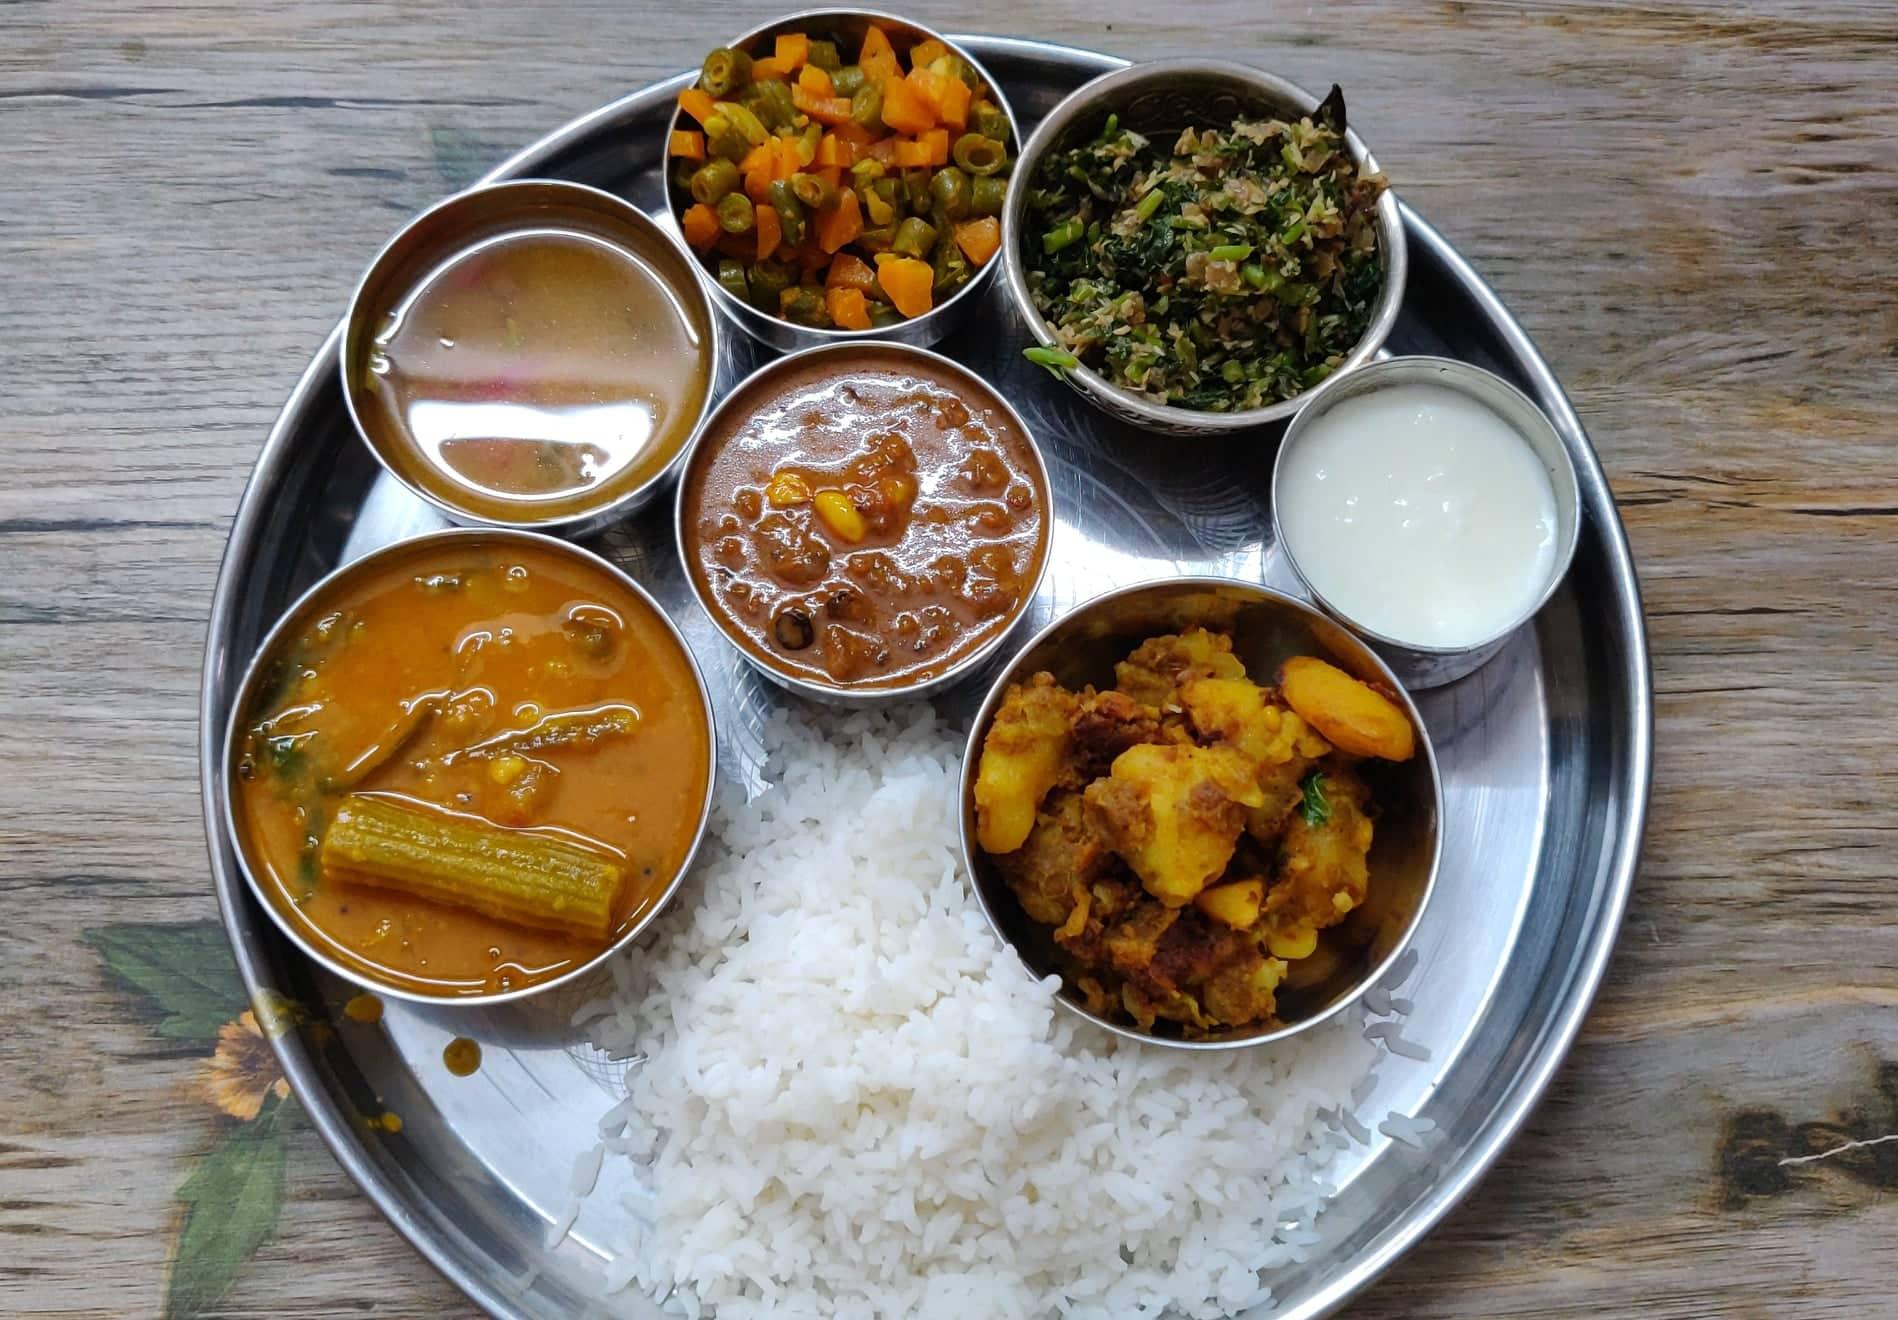 Veg Lunch Menu 4 | Weekend Lunch Menu | Sambar, vatha kuzhambu, Potato fry, carrot beans poriyal, Keerai poriyal